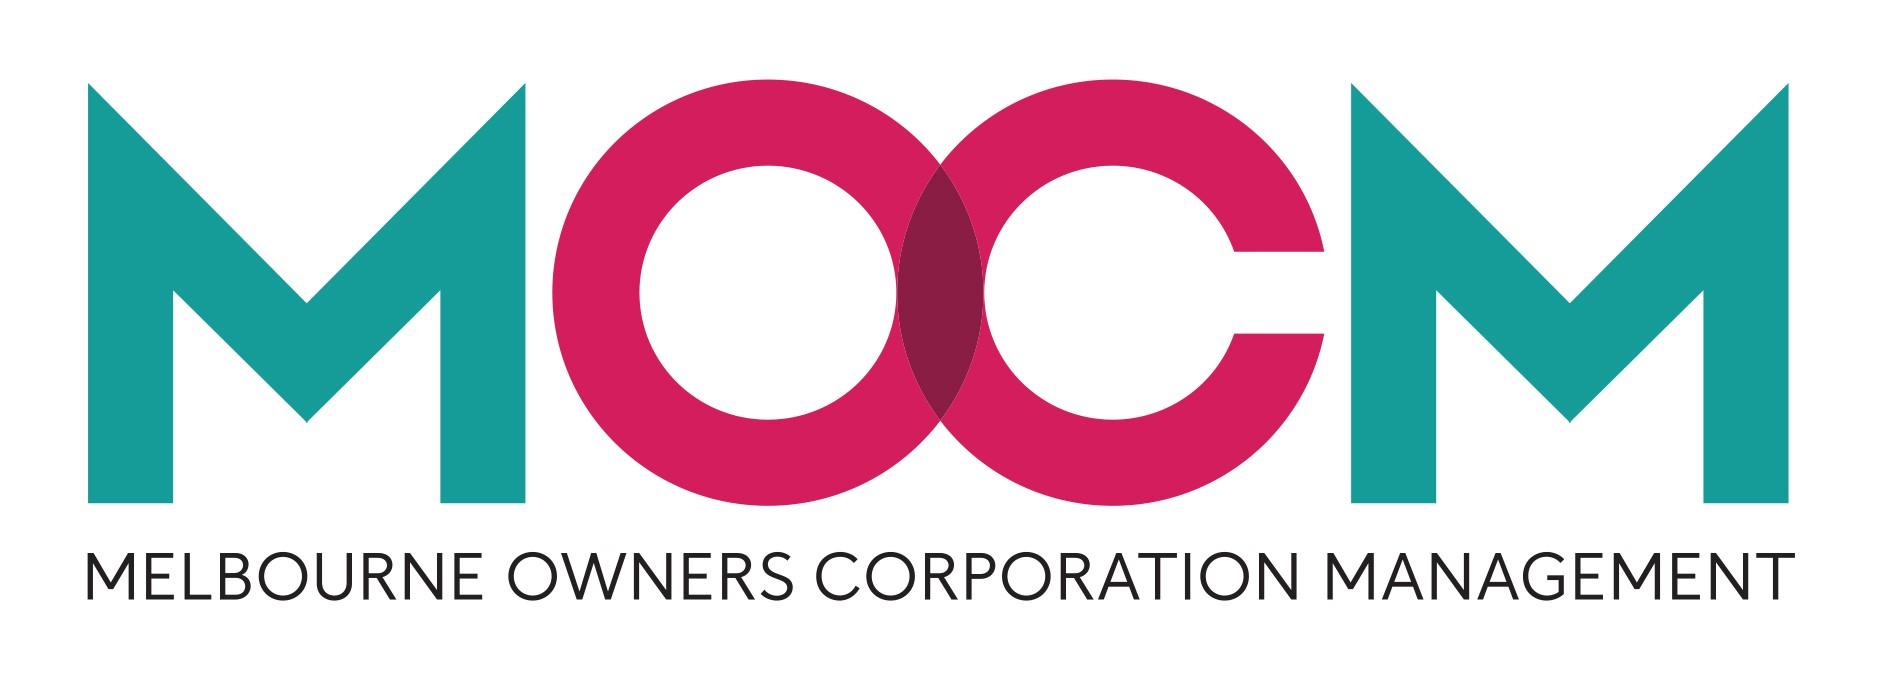 melbourne owners corporation management